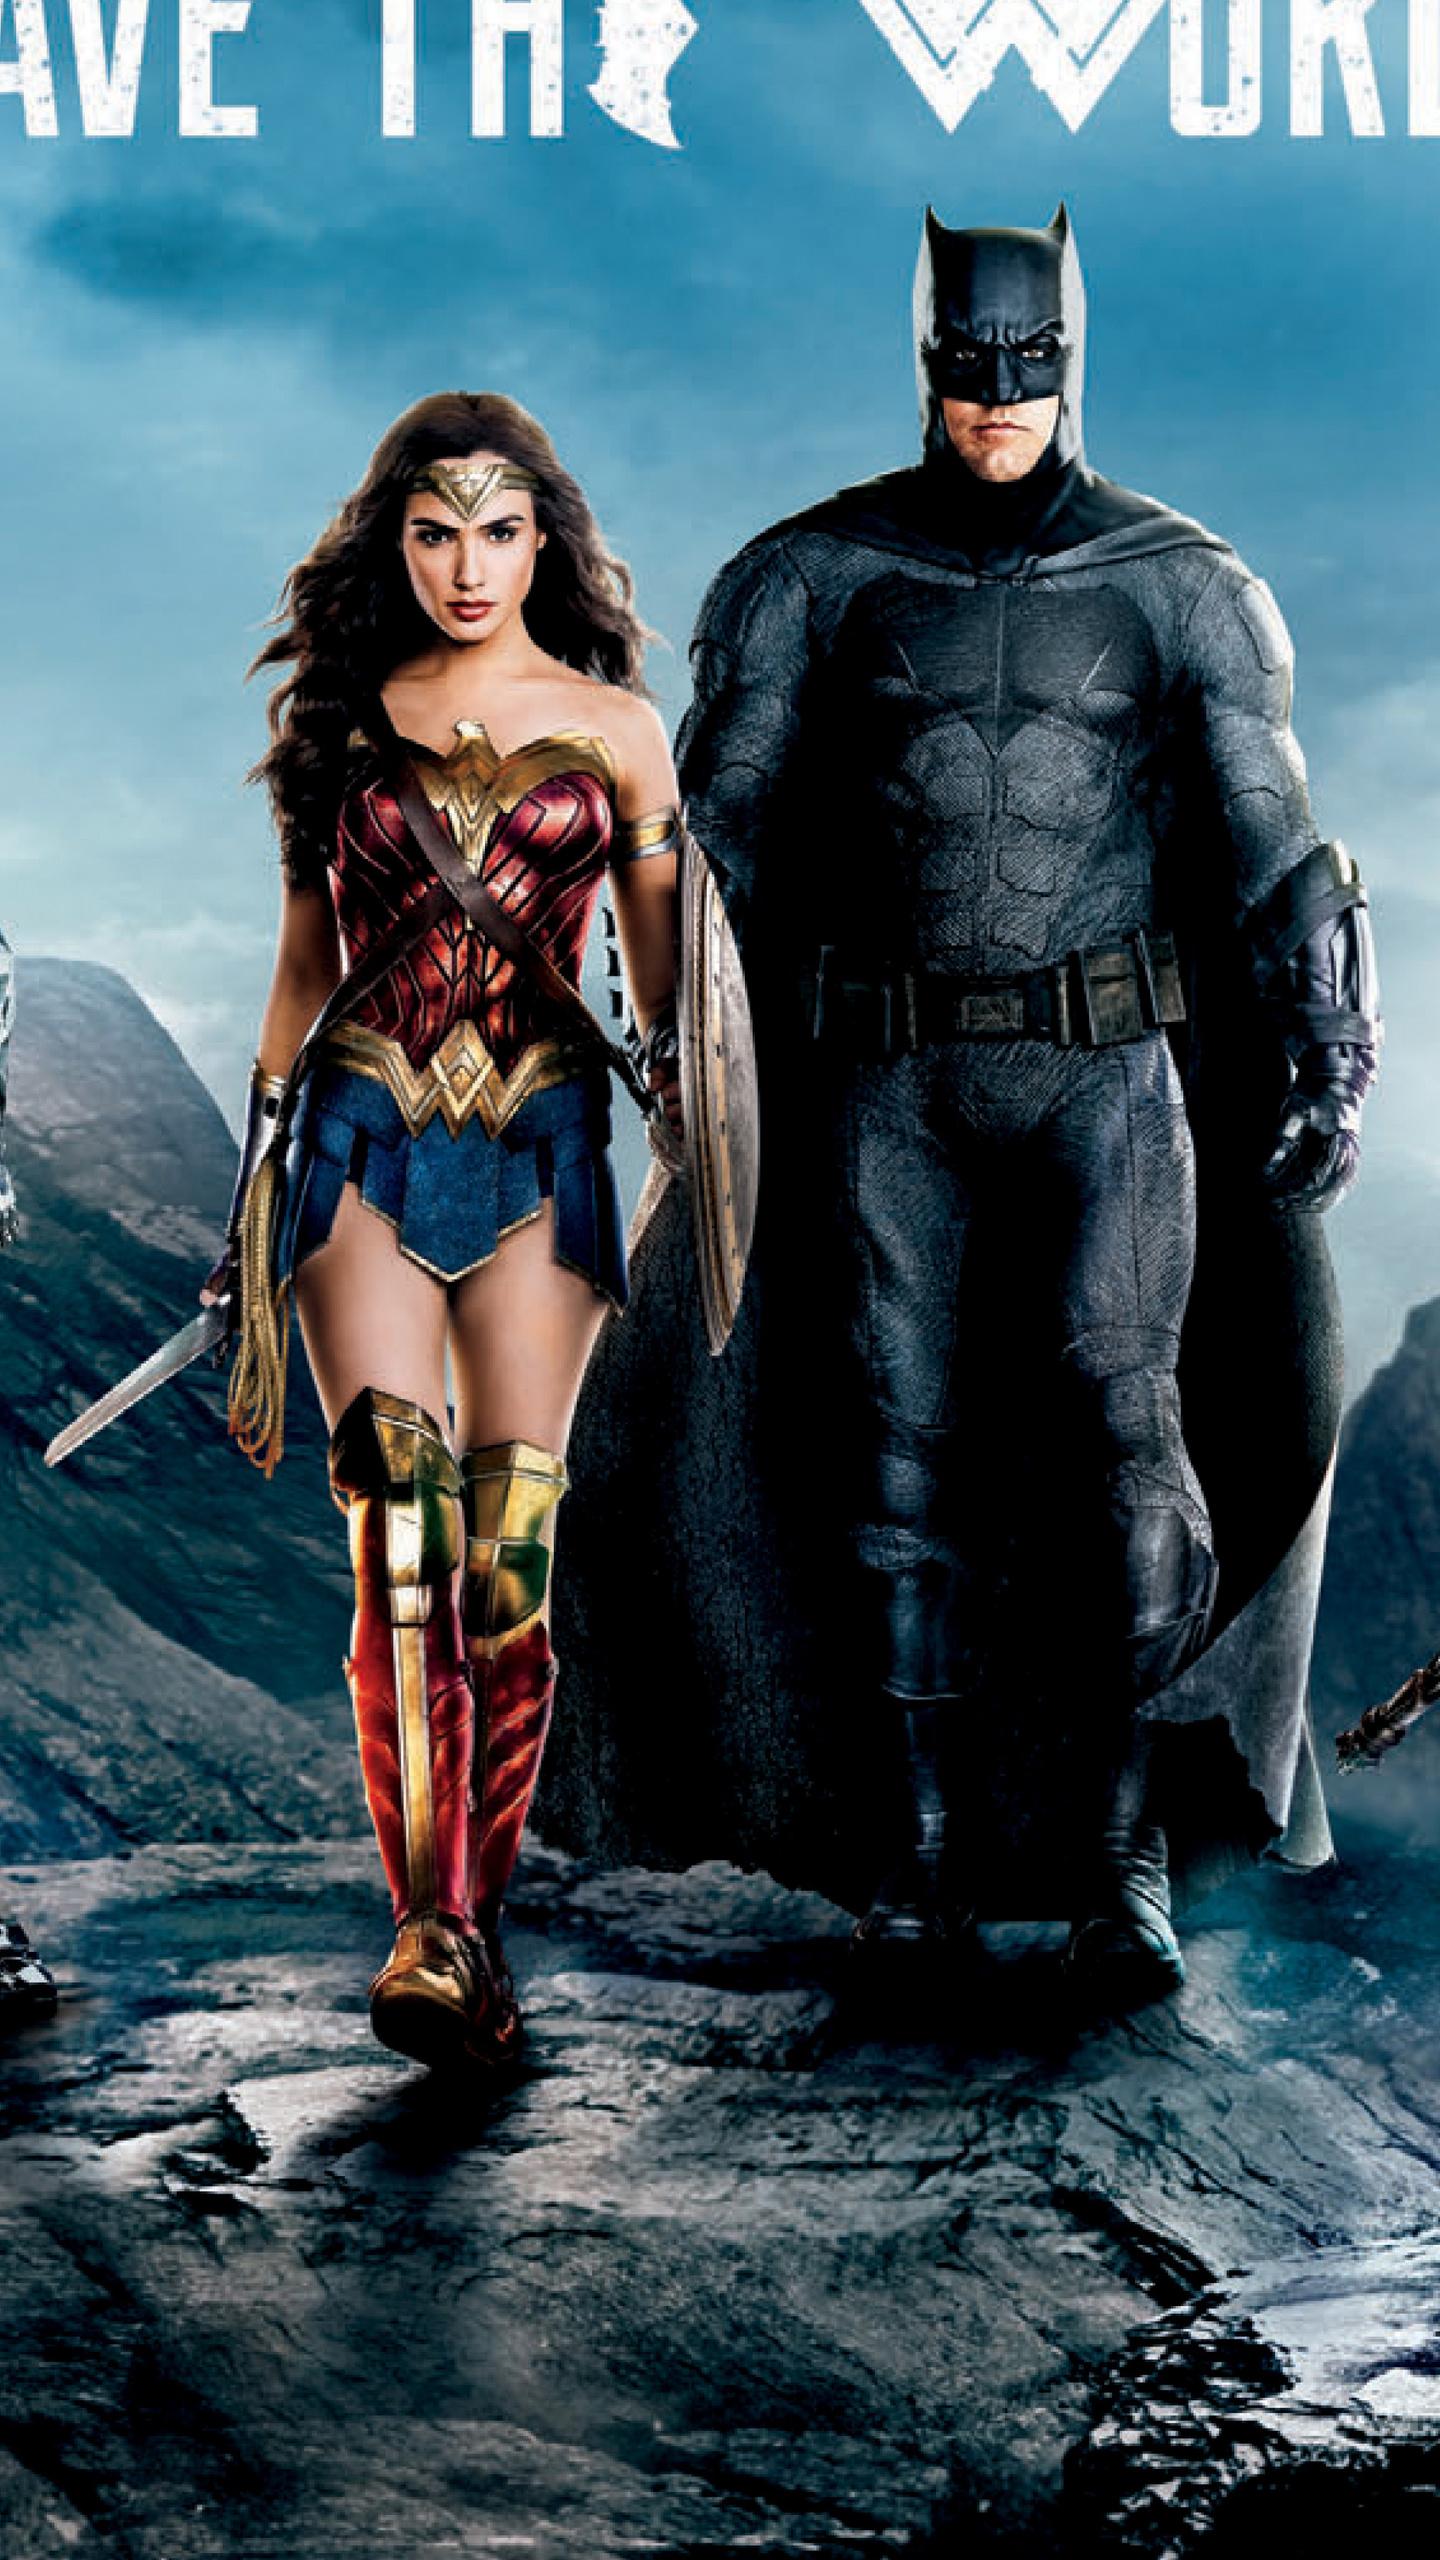 justice-league-flash-cyborg-wonder-woman-batman-aquaman-t7.jpg